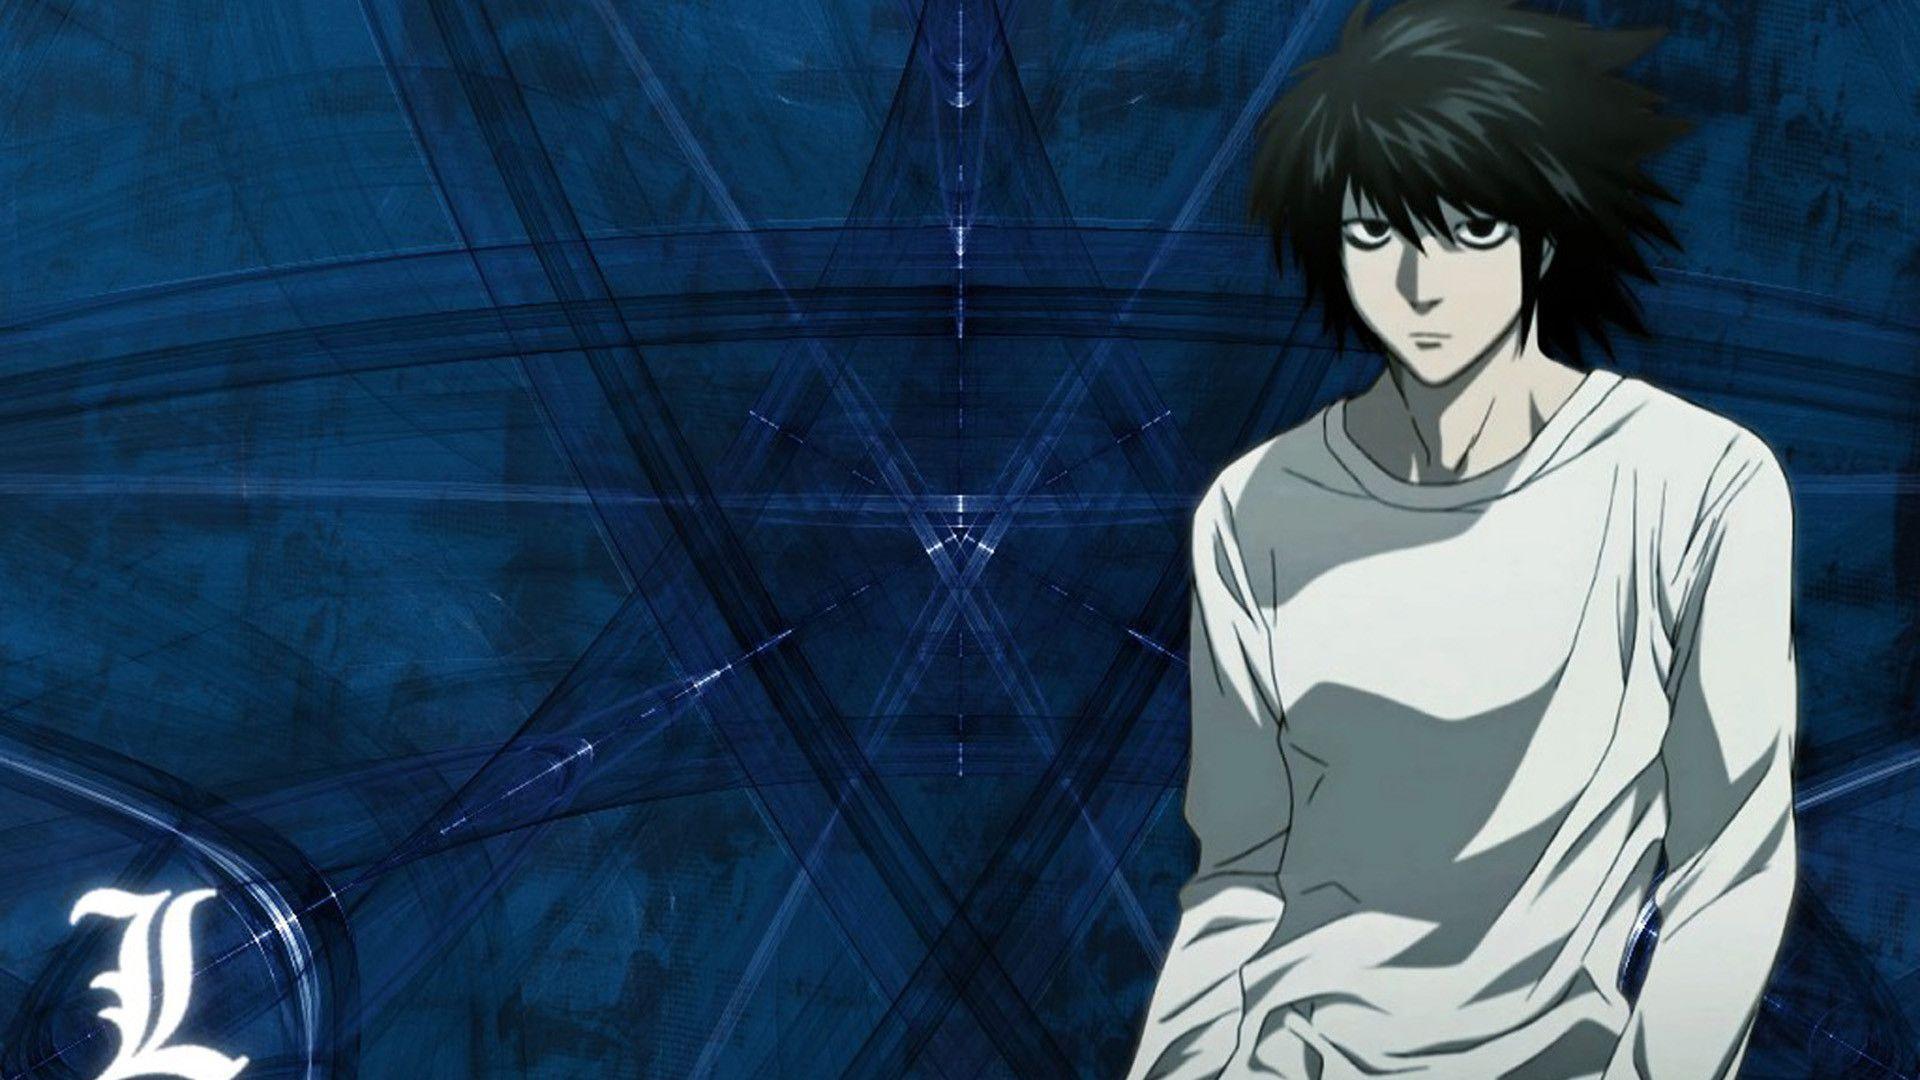 Death Note L Images Wallpaper HD - dlwallhd.